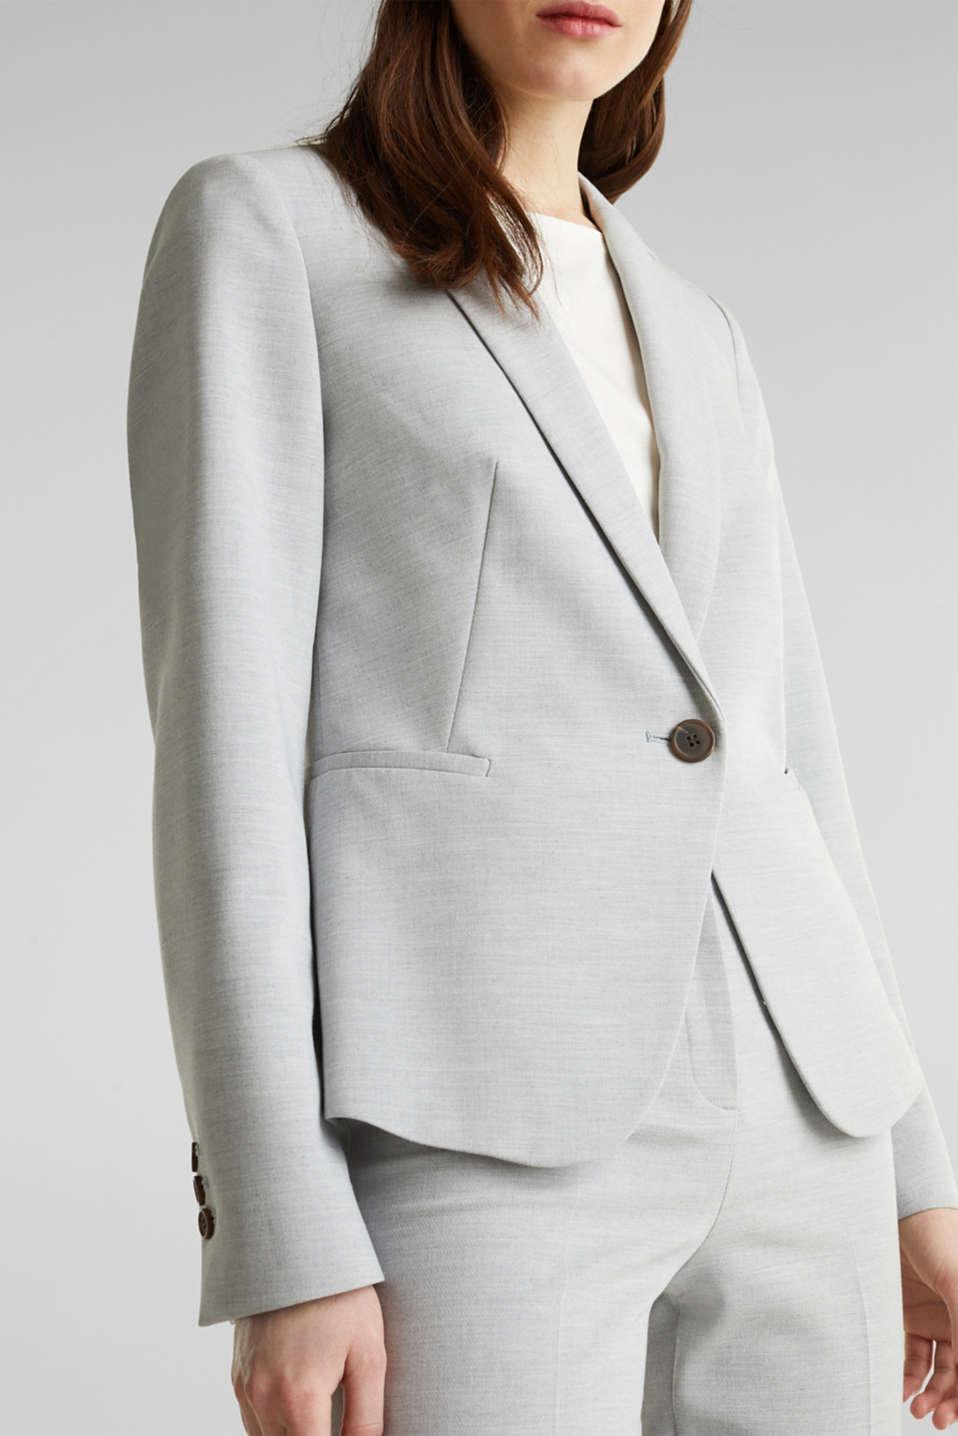 SUMMER BIZ mix + match stretch blazer, LIGHT GREY 5, detail image number 2